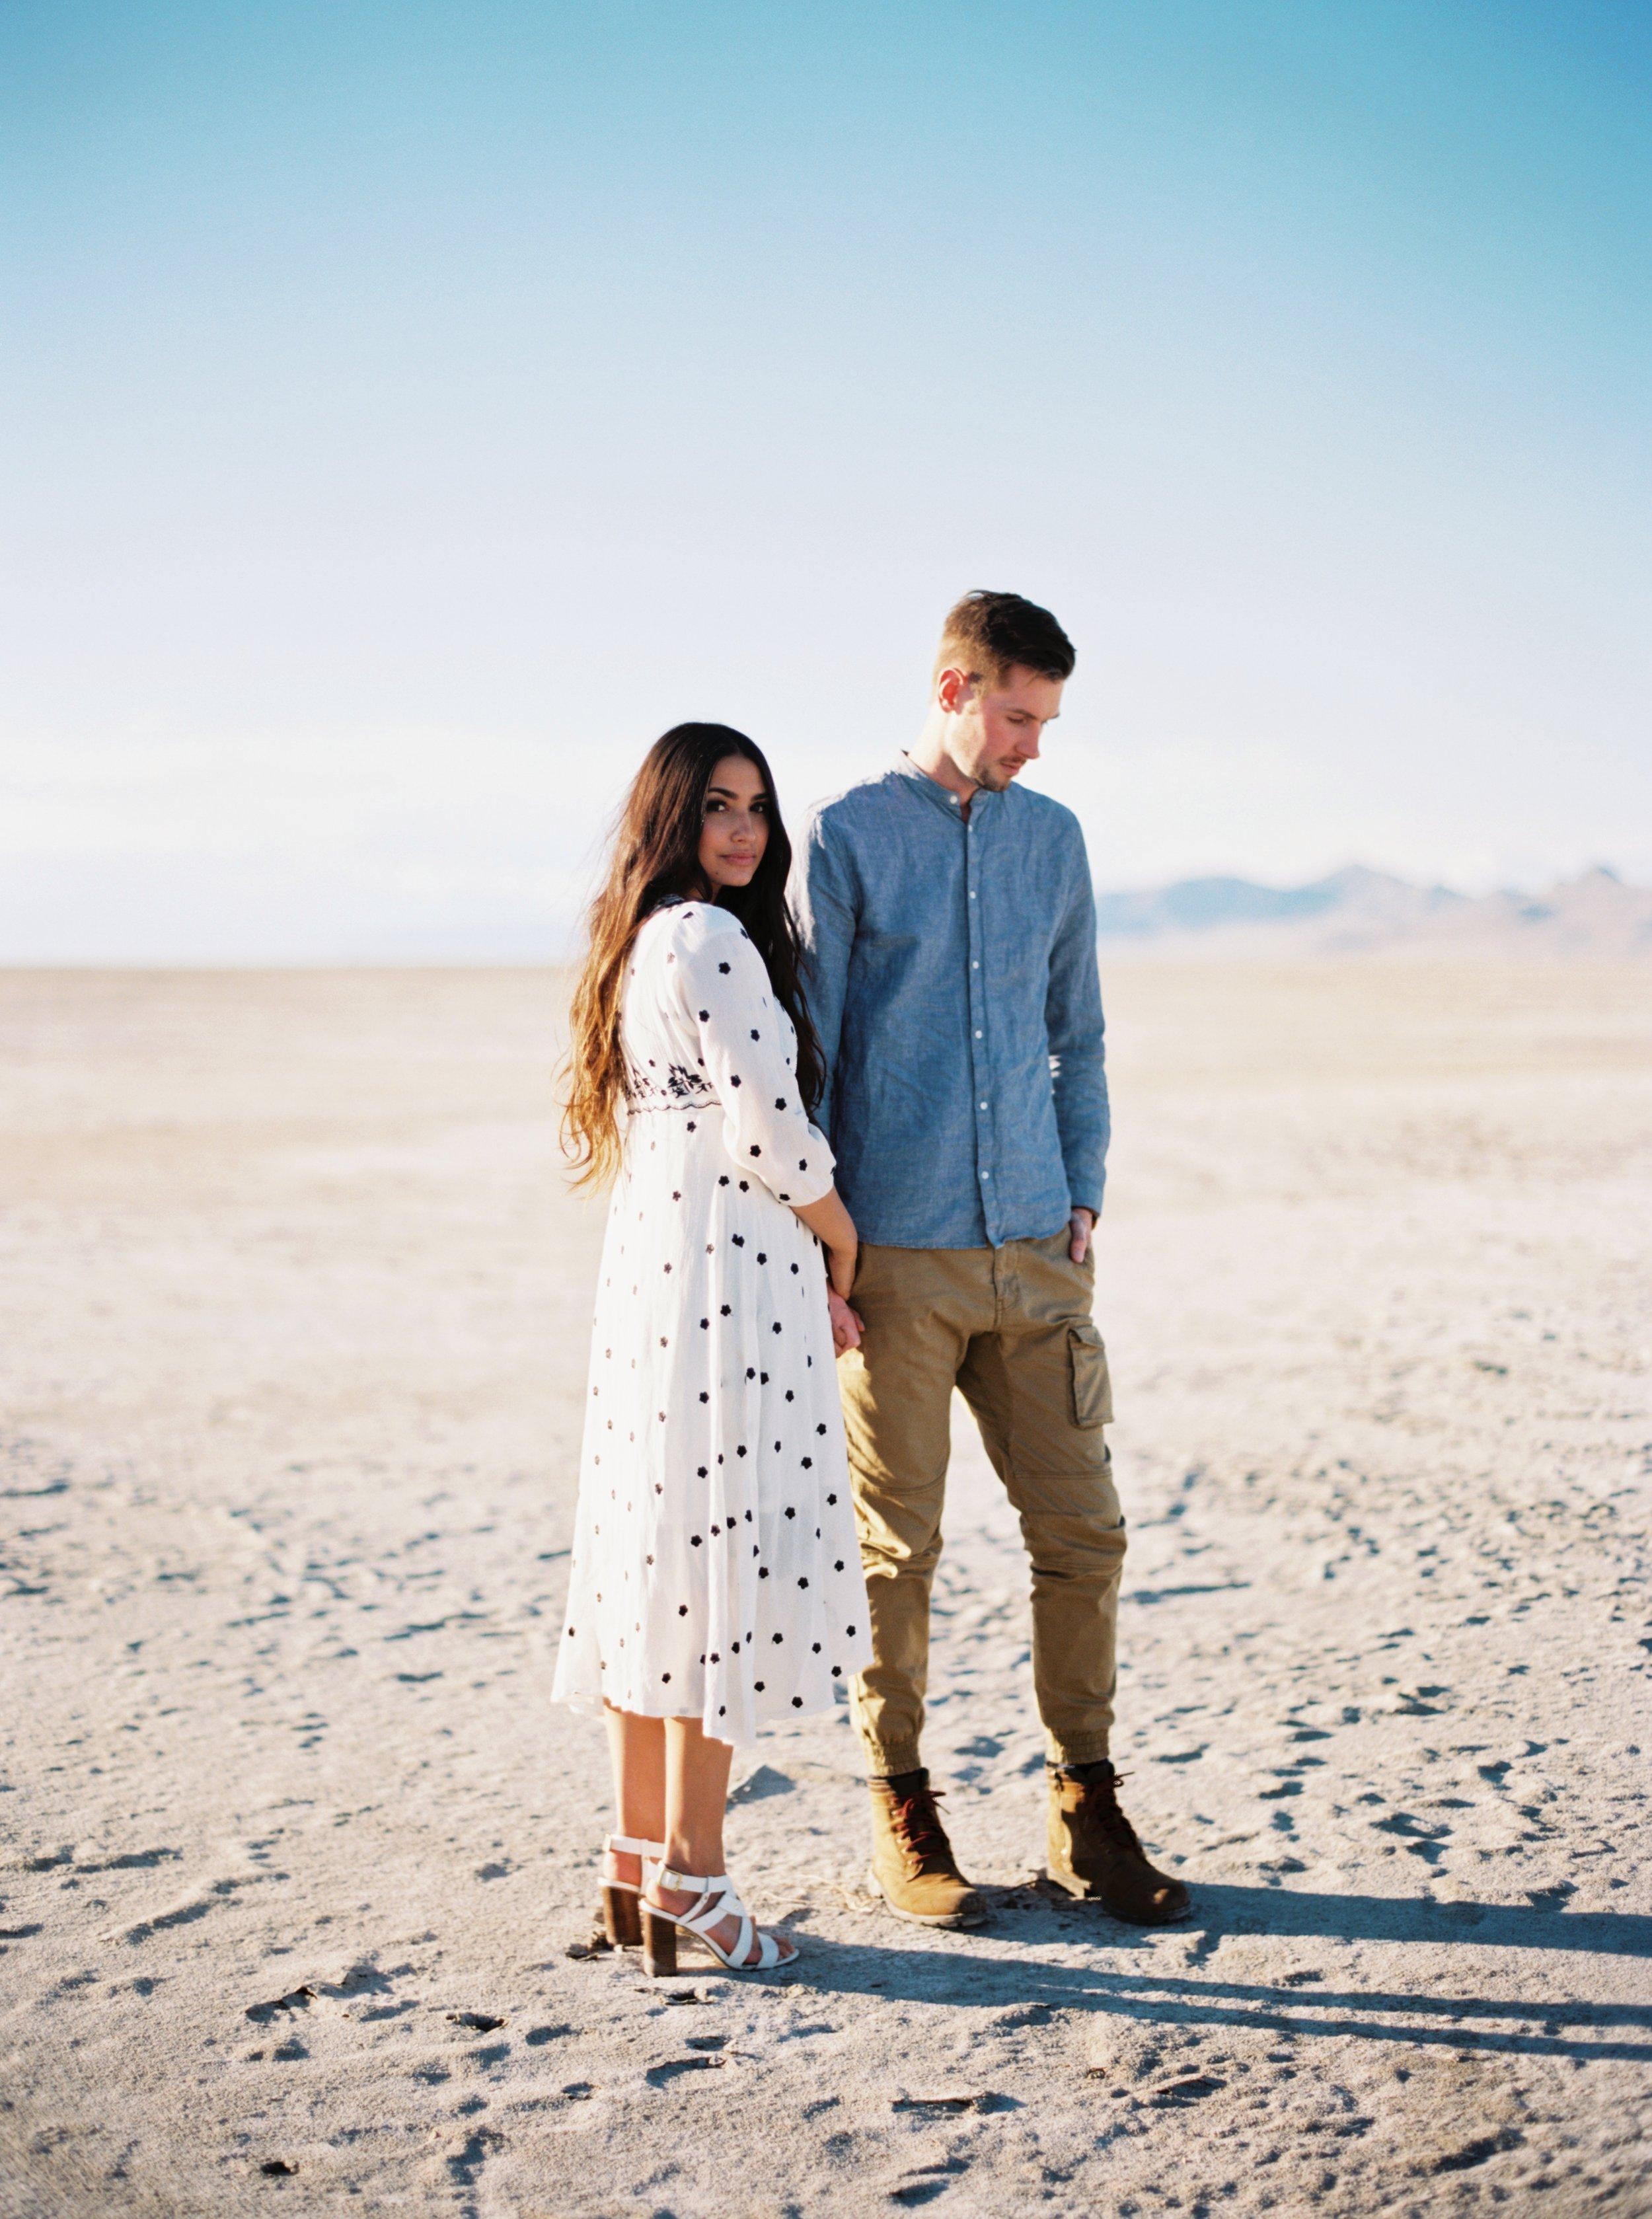 Kyle John l Fine Art Wedding Photography l Chicago, Copenhagen, California, New York, Destination l Blog l Michelle & Kyle_Salt Lake_13